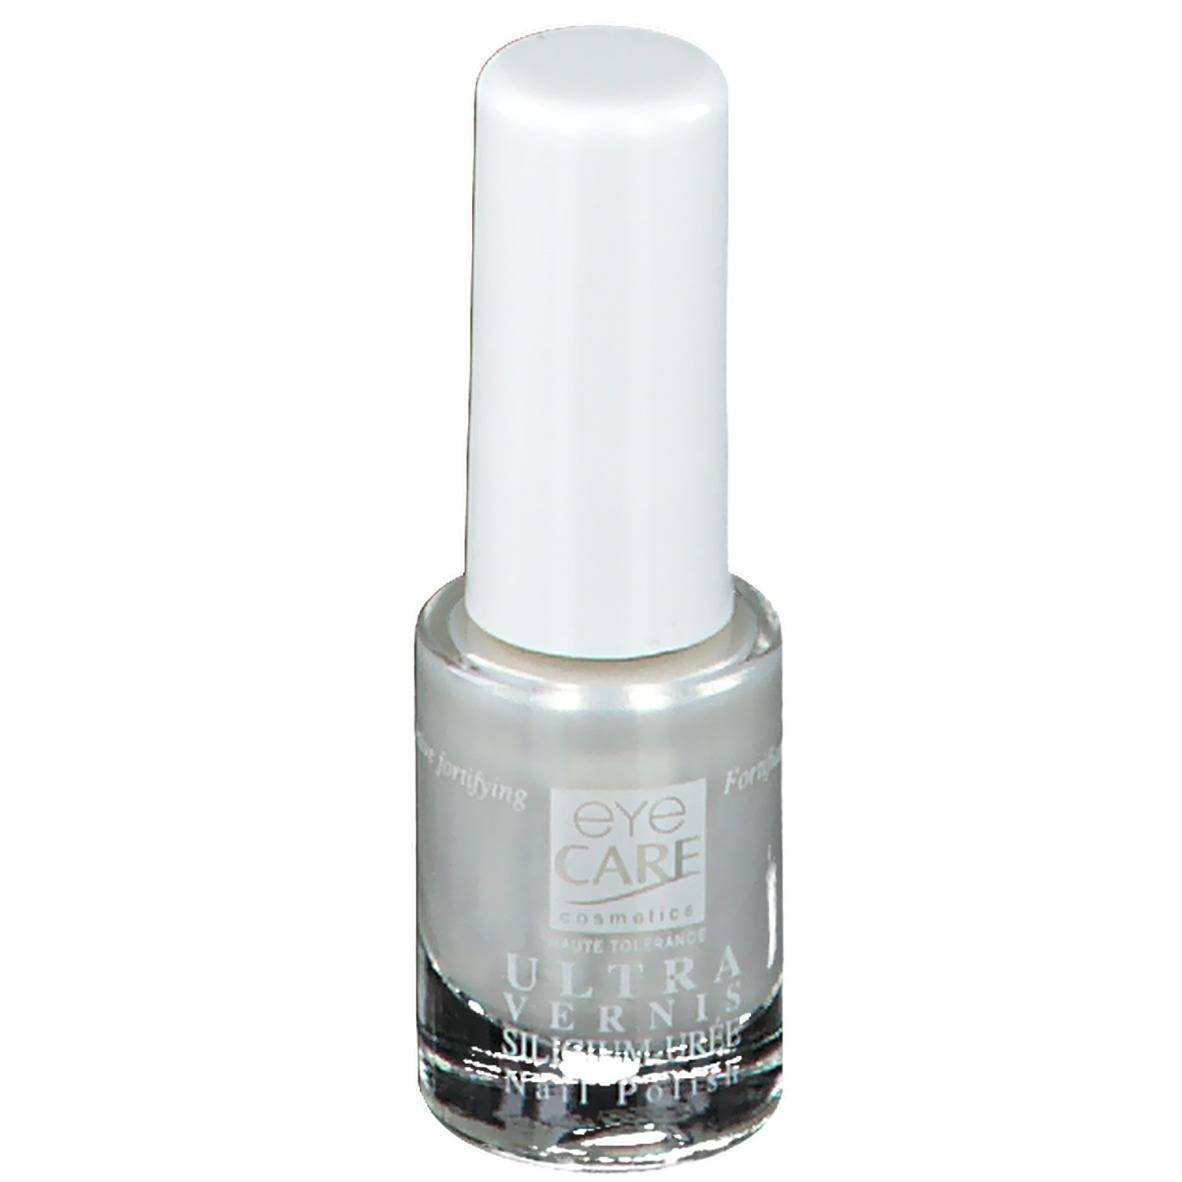 Eye care cosmetics eyeCARE Ultra vernis silicium-urée Nacre ml vernis à ongles